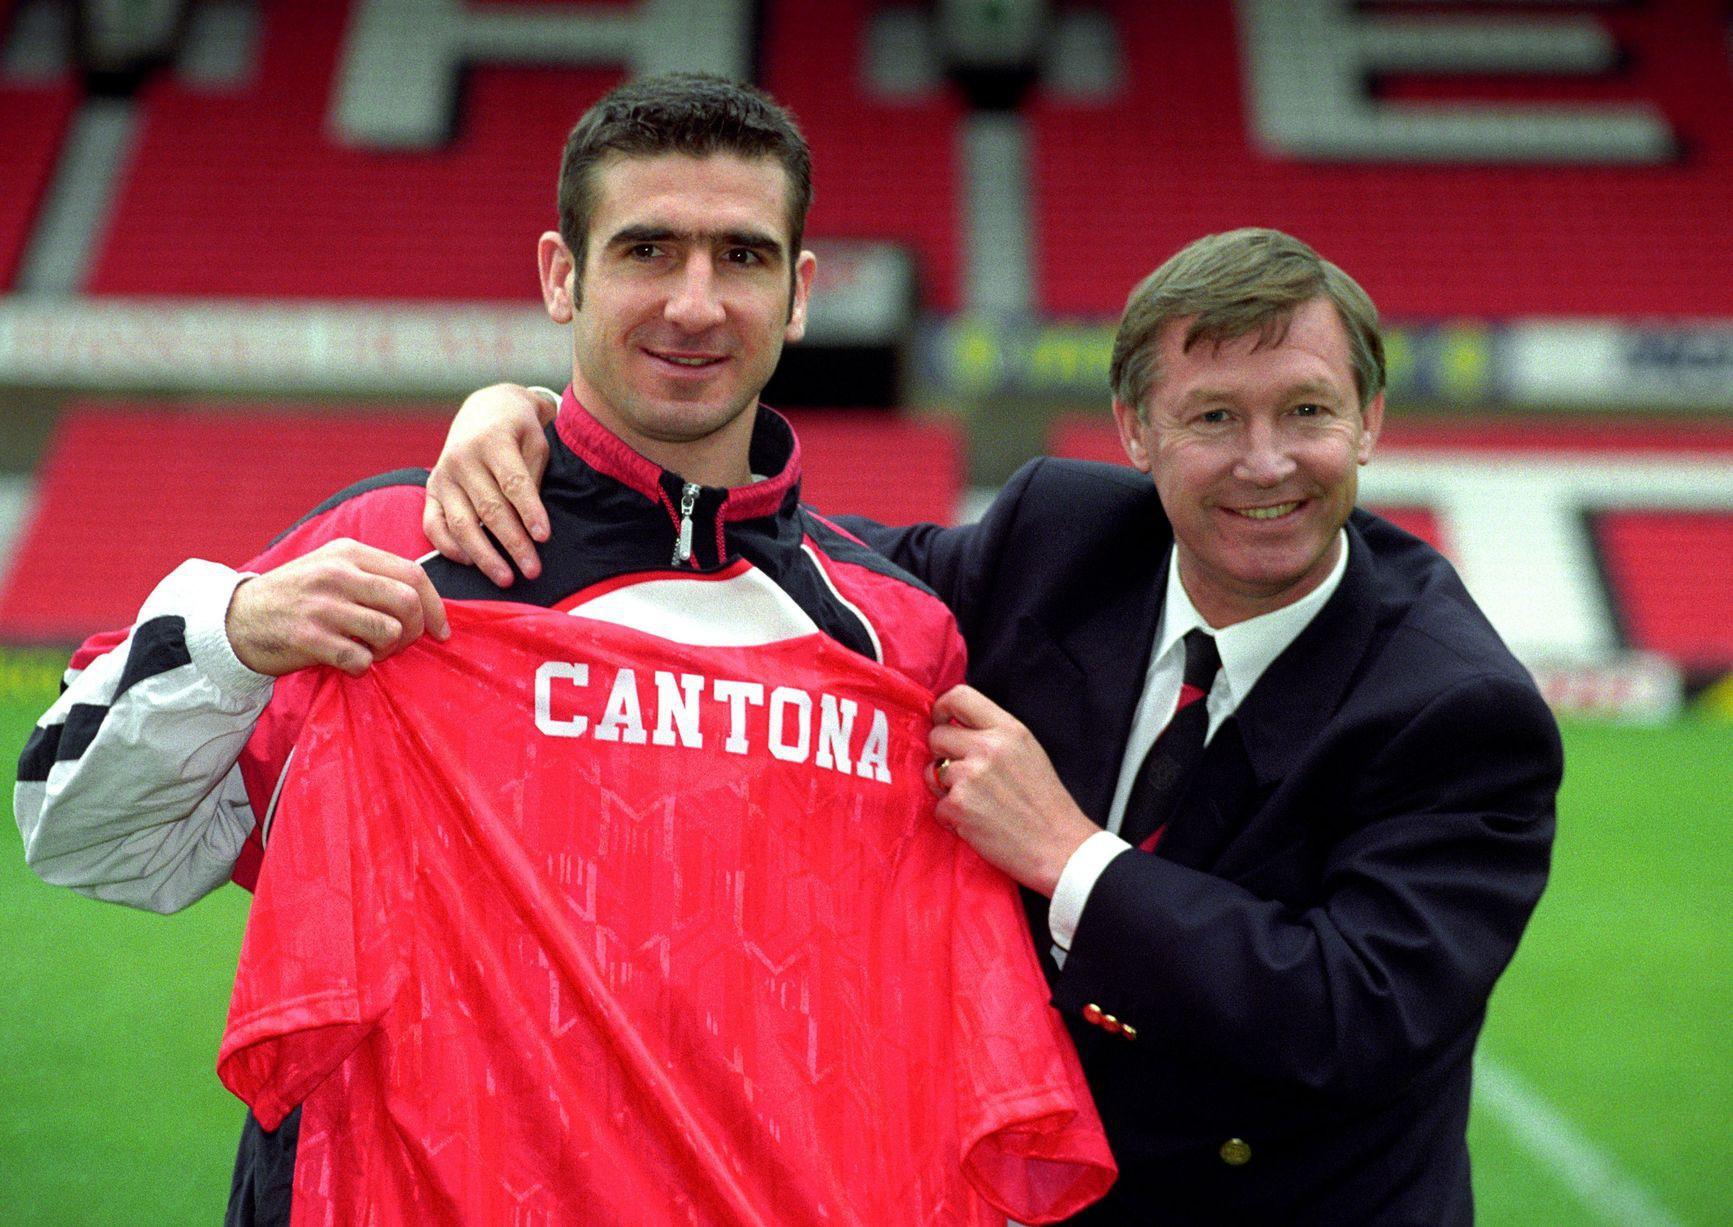 Alex Ferguson and Eric Cfntona